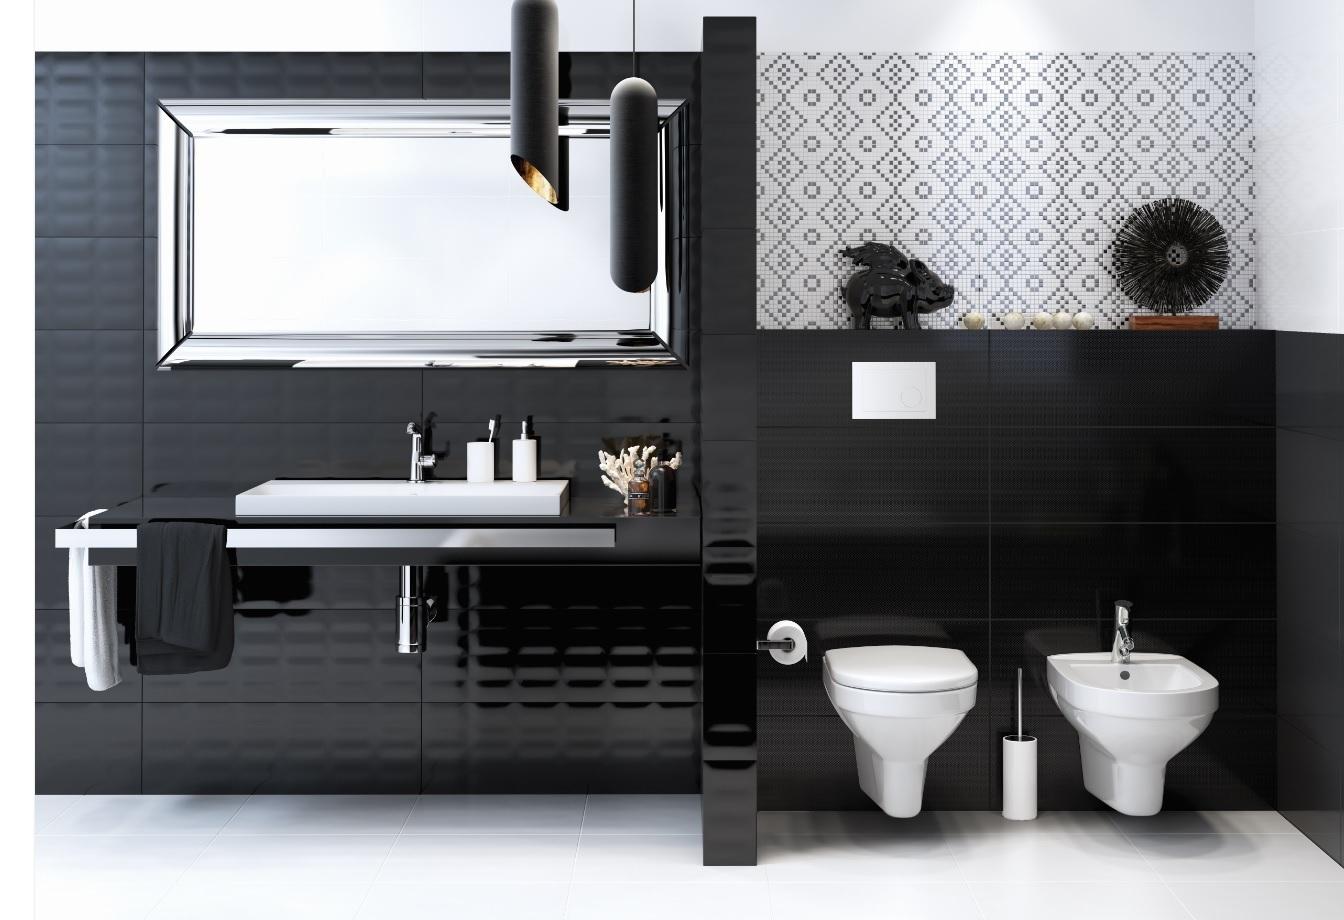 Dekorfliese meissen magic mosaik schwarz wei 25x75 cm for Dekorfliesen badezimmer